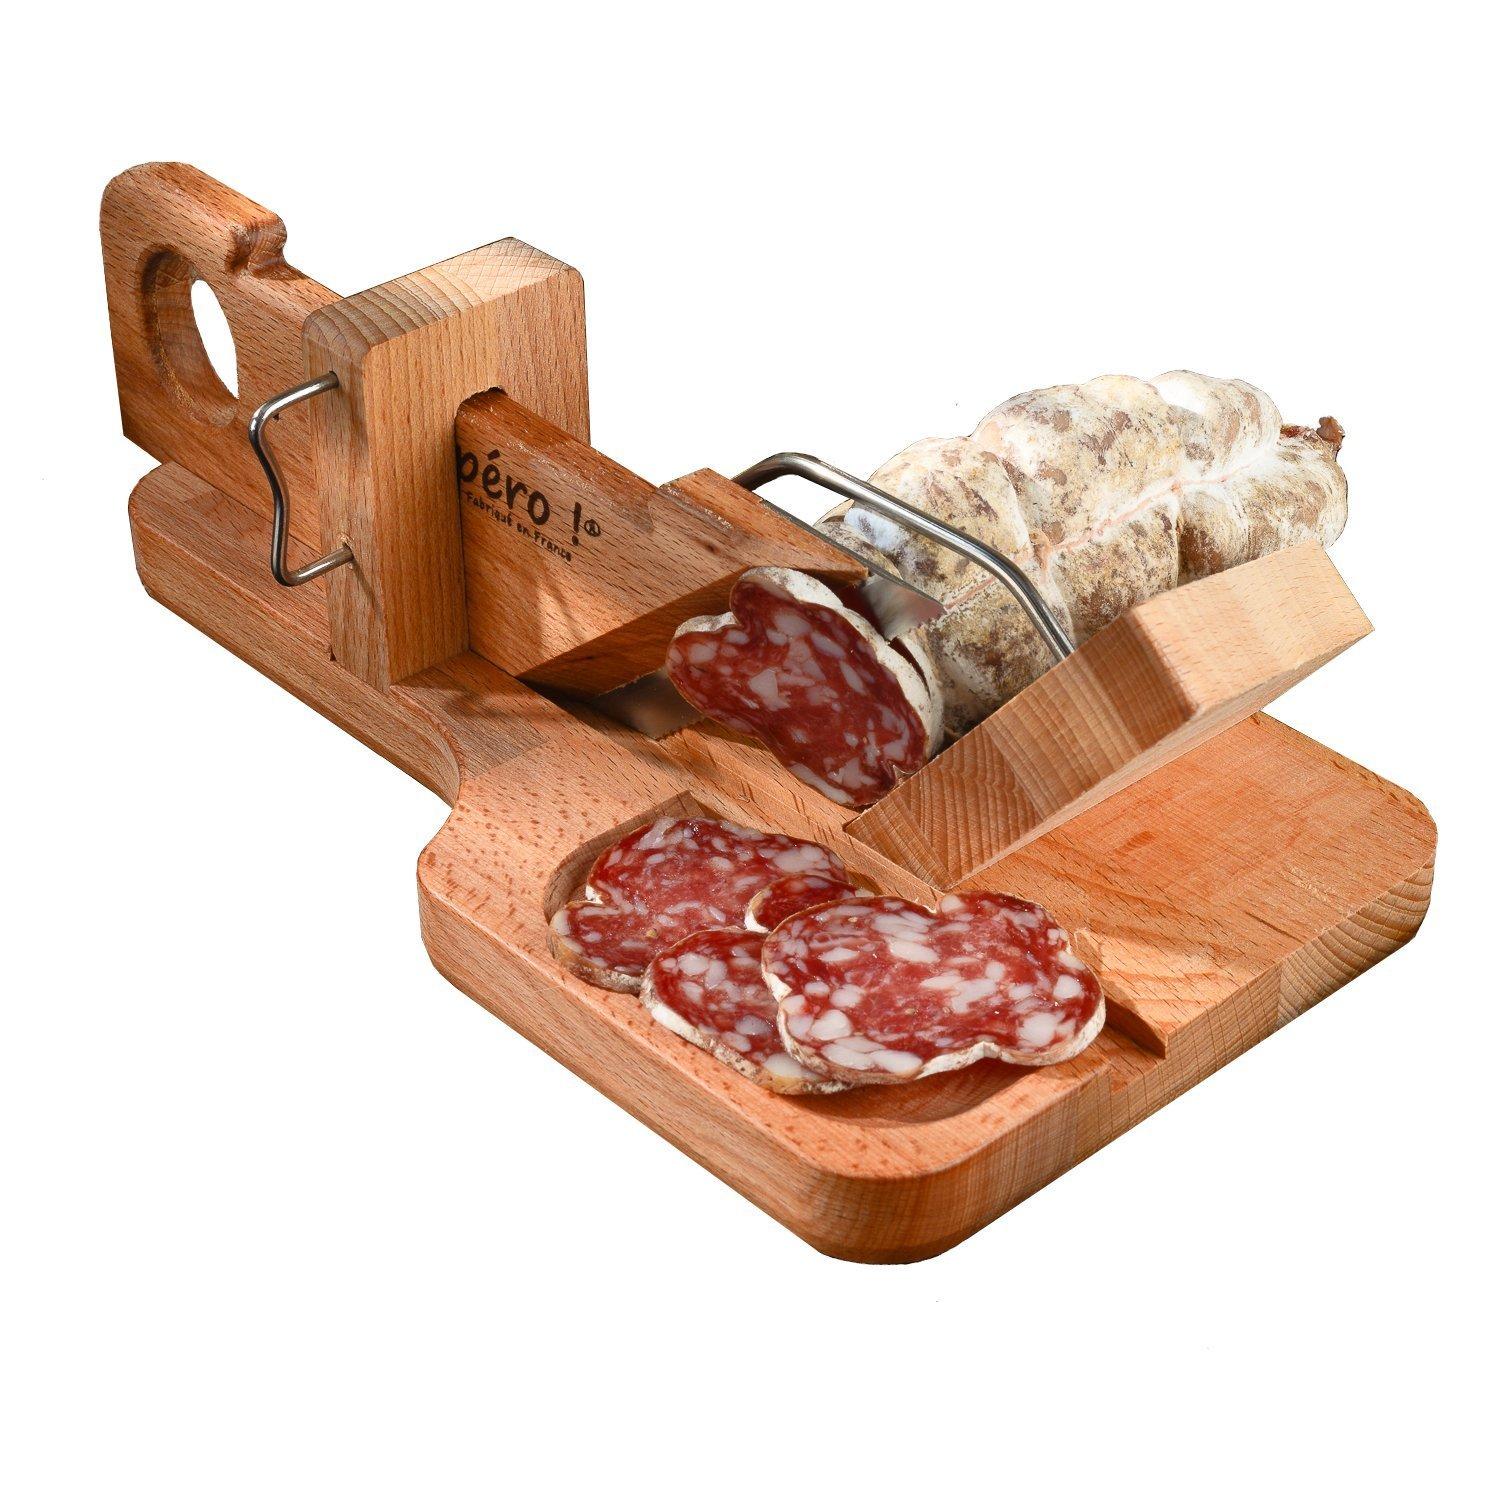 World Cuisine Salami Slicer 280X160X90 mm Bron Coucke A4982103